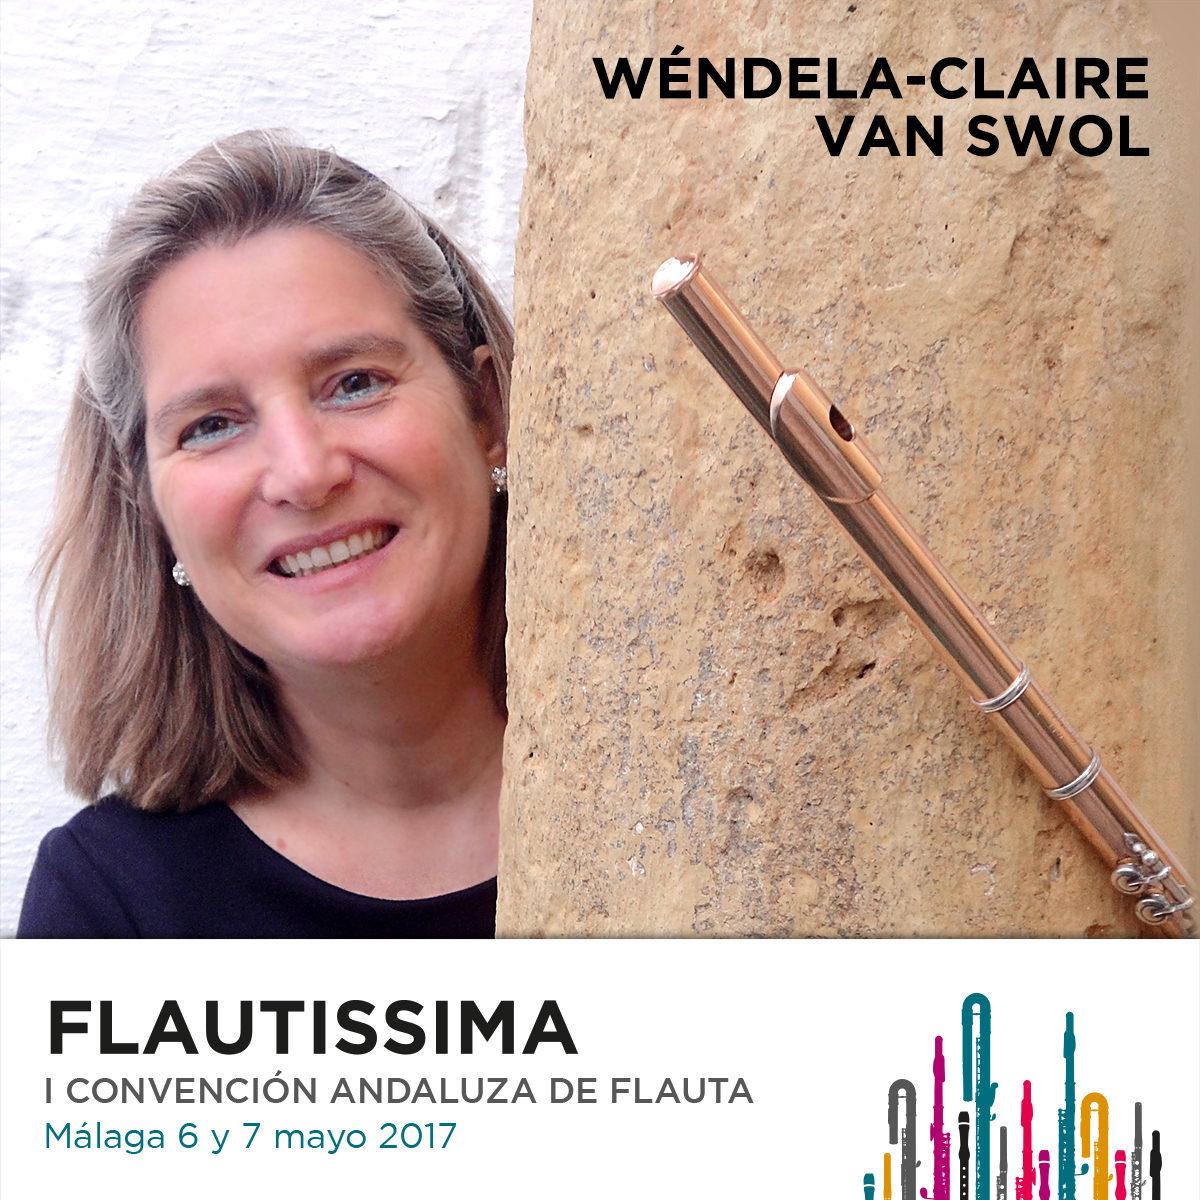 Wéndela Claire van Swol Flautissima